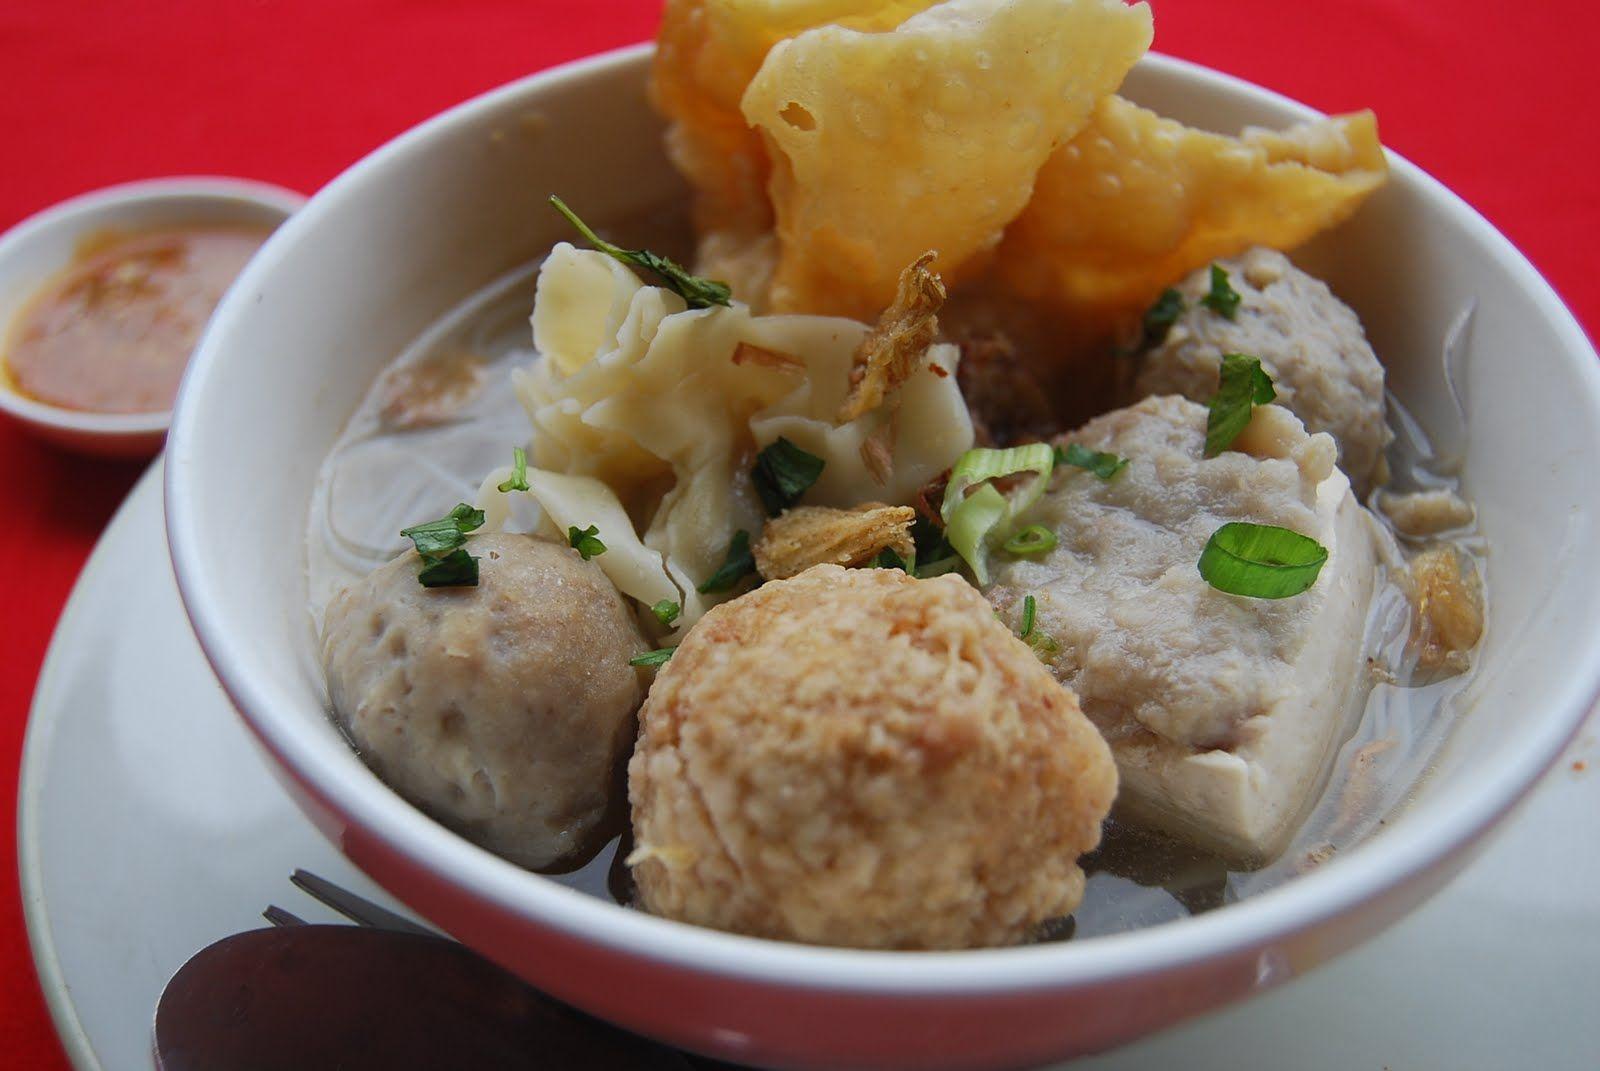 How To Make Delicious Beef Meatballs Resep Bakso Resep Makanan